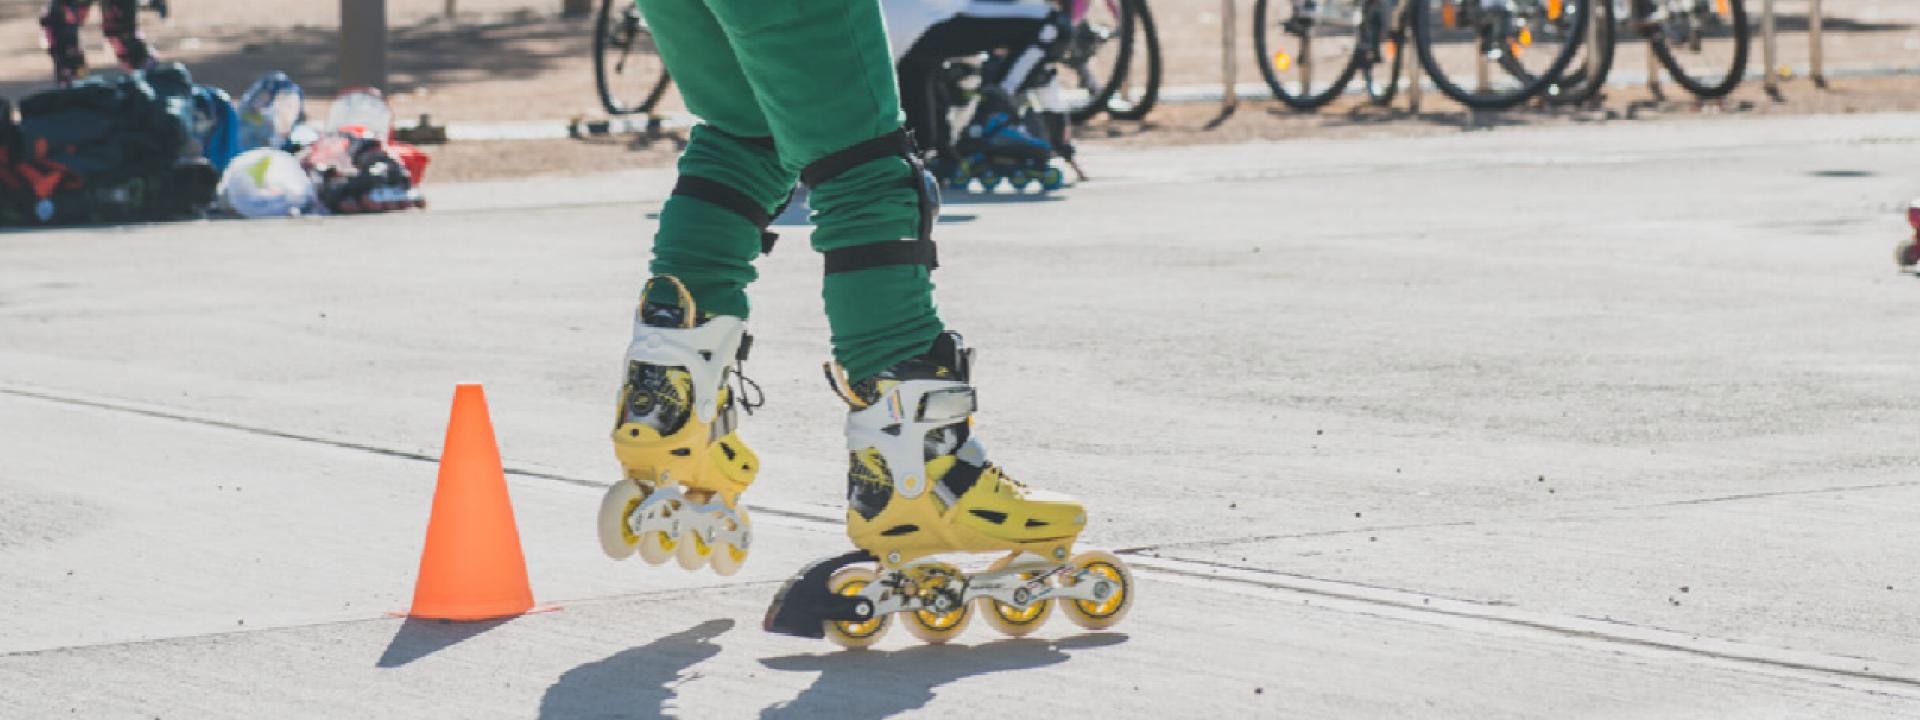 Roller Skates για παιδιά - Εικόνα